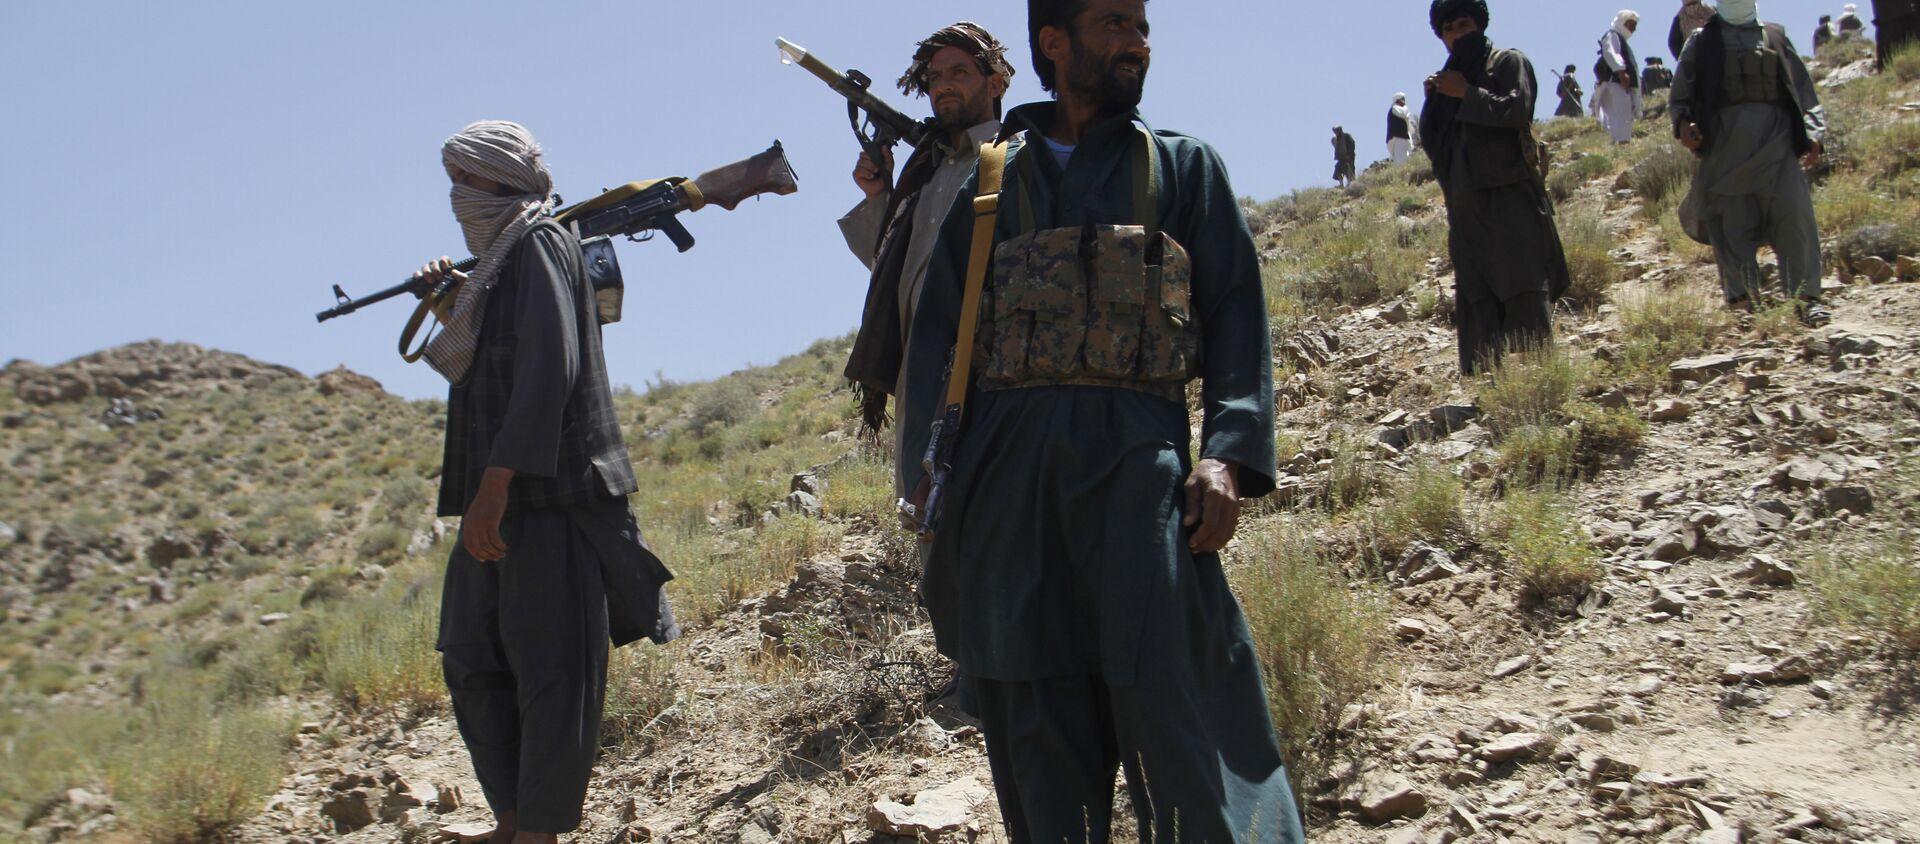 Taliban fighters. (File) - Sputnik International, 1920, 09.07.2021